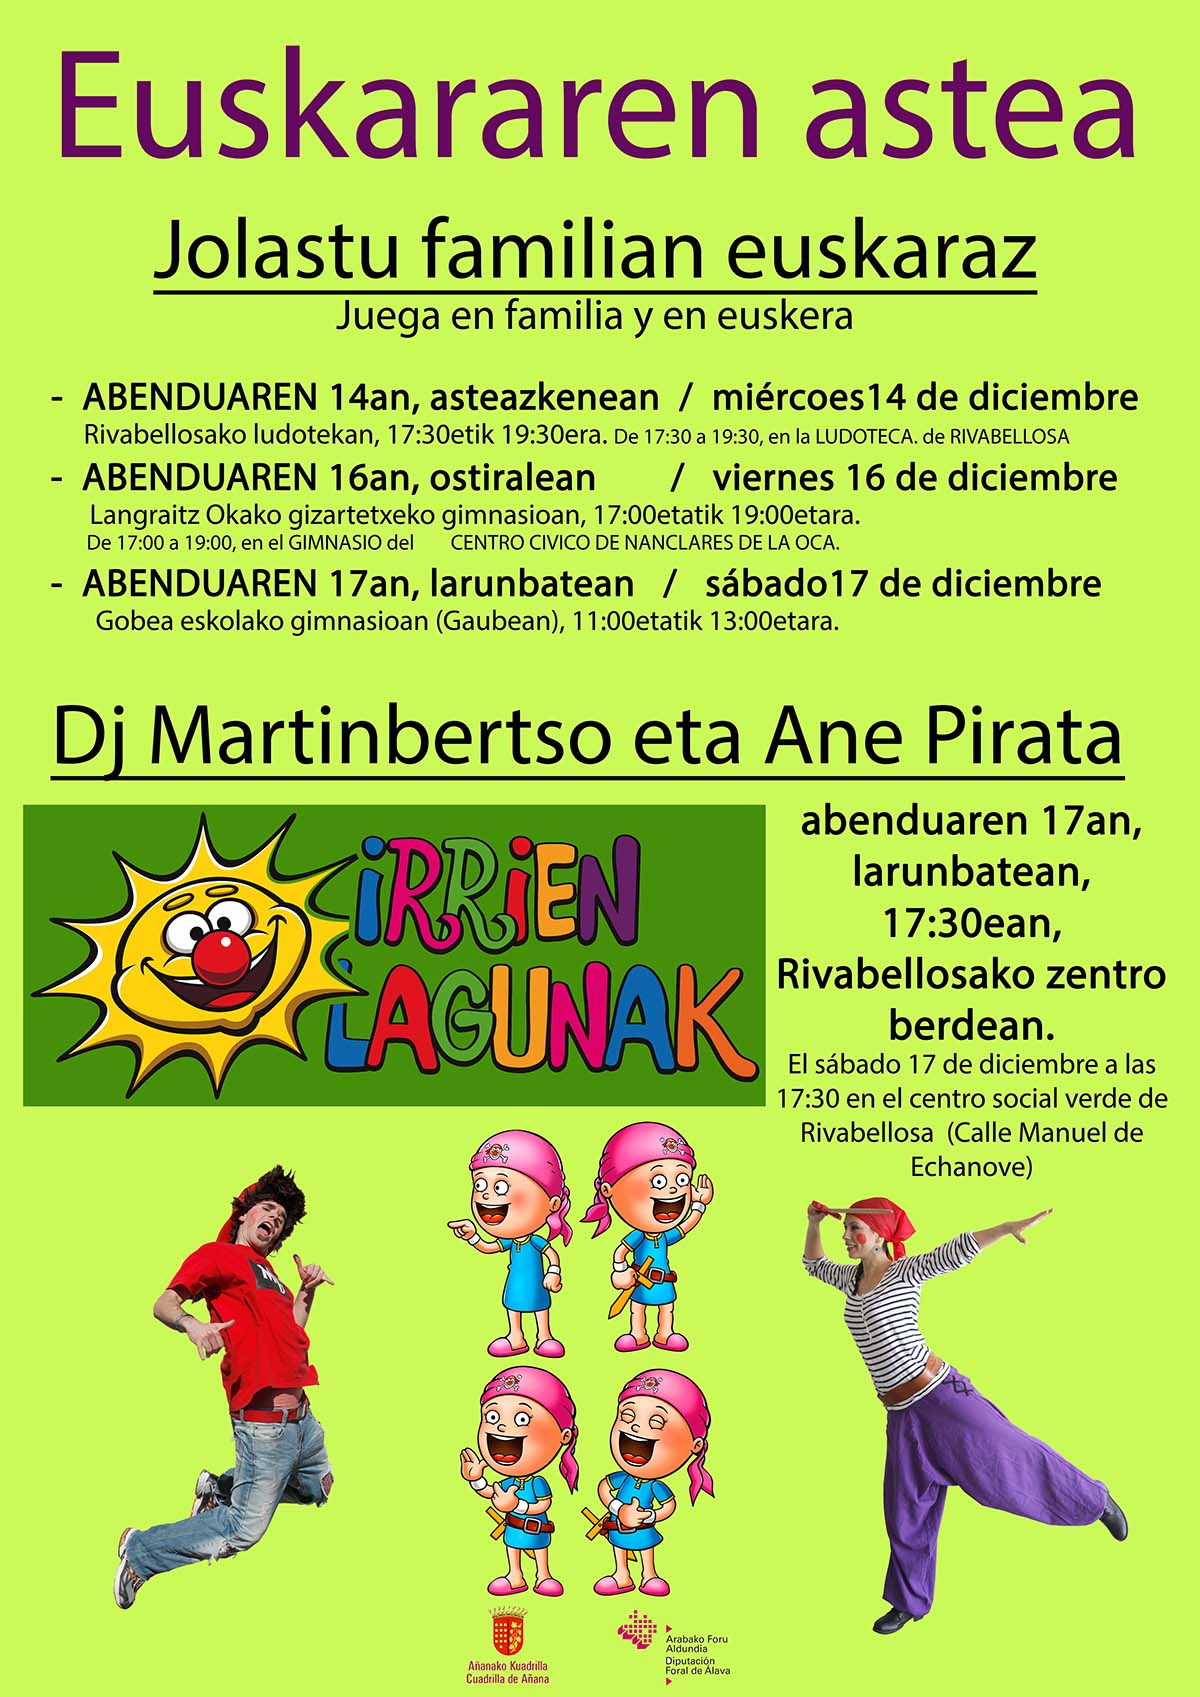 EUSKARAREN ASTEA, Jolastu familian euskaraz, La Cuadrilla de Añana organiza juegos en familia y en Euskera